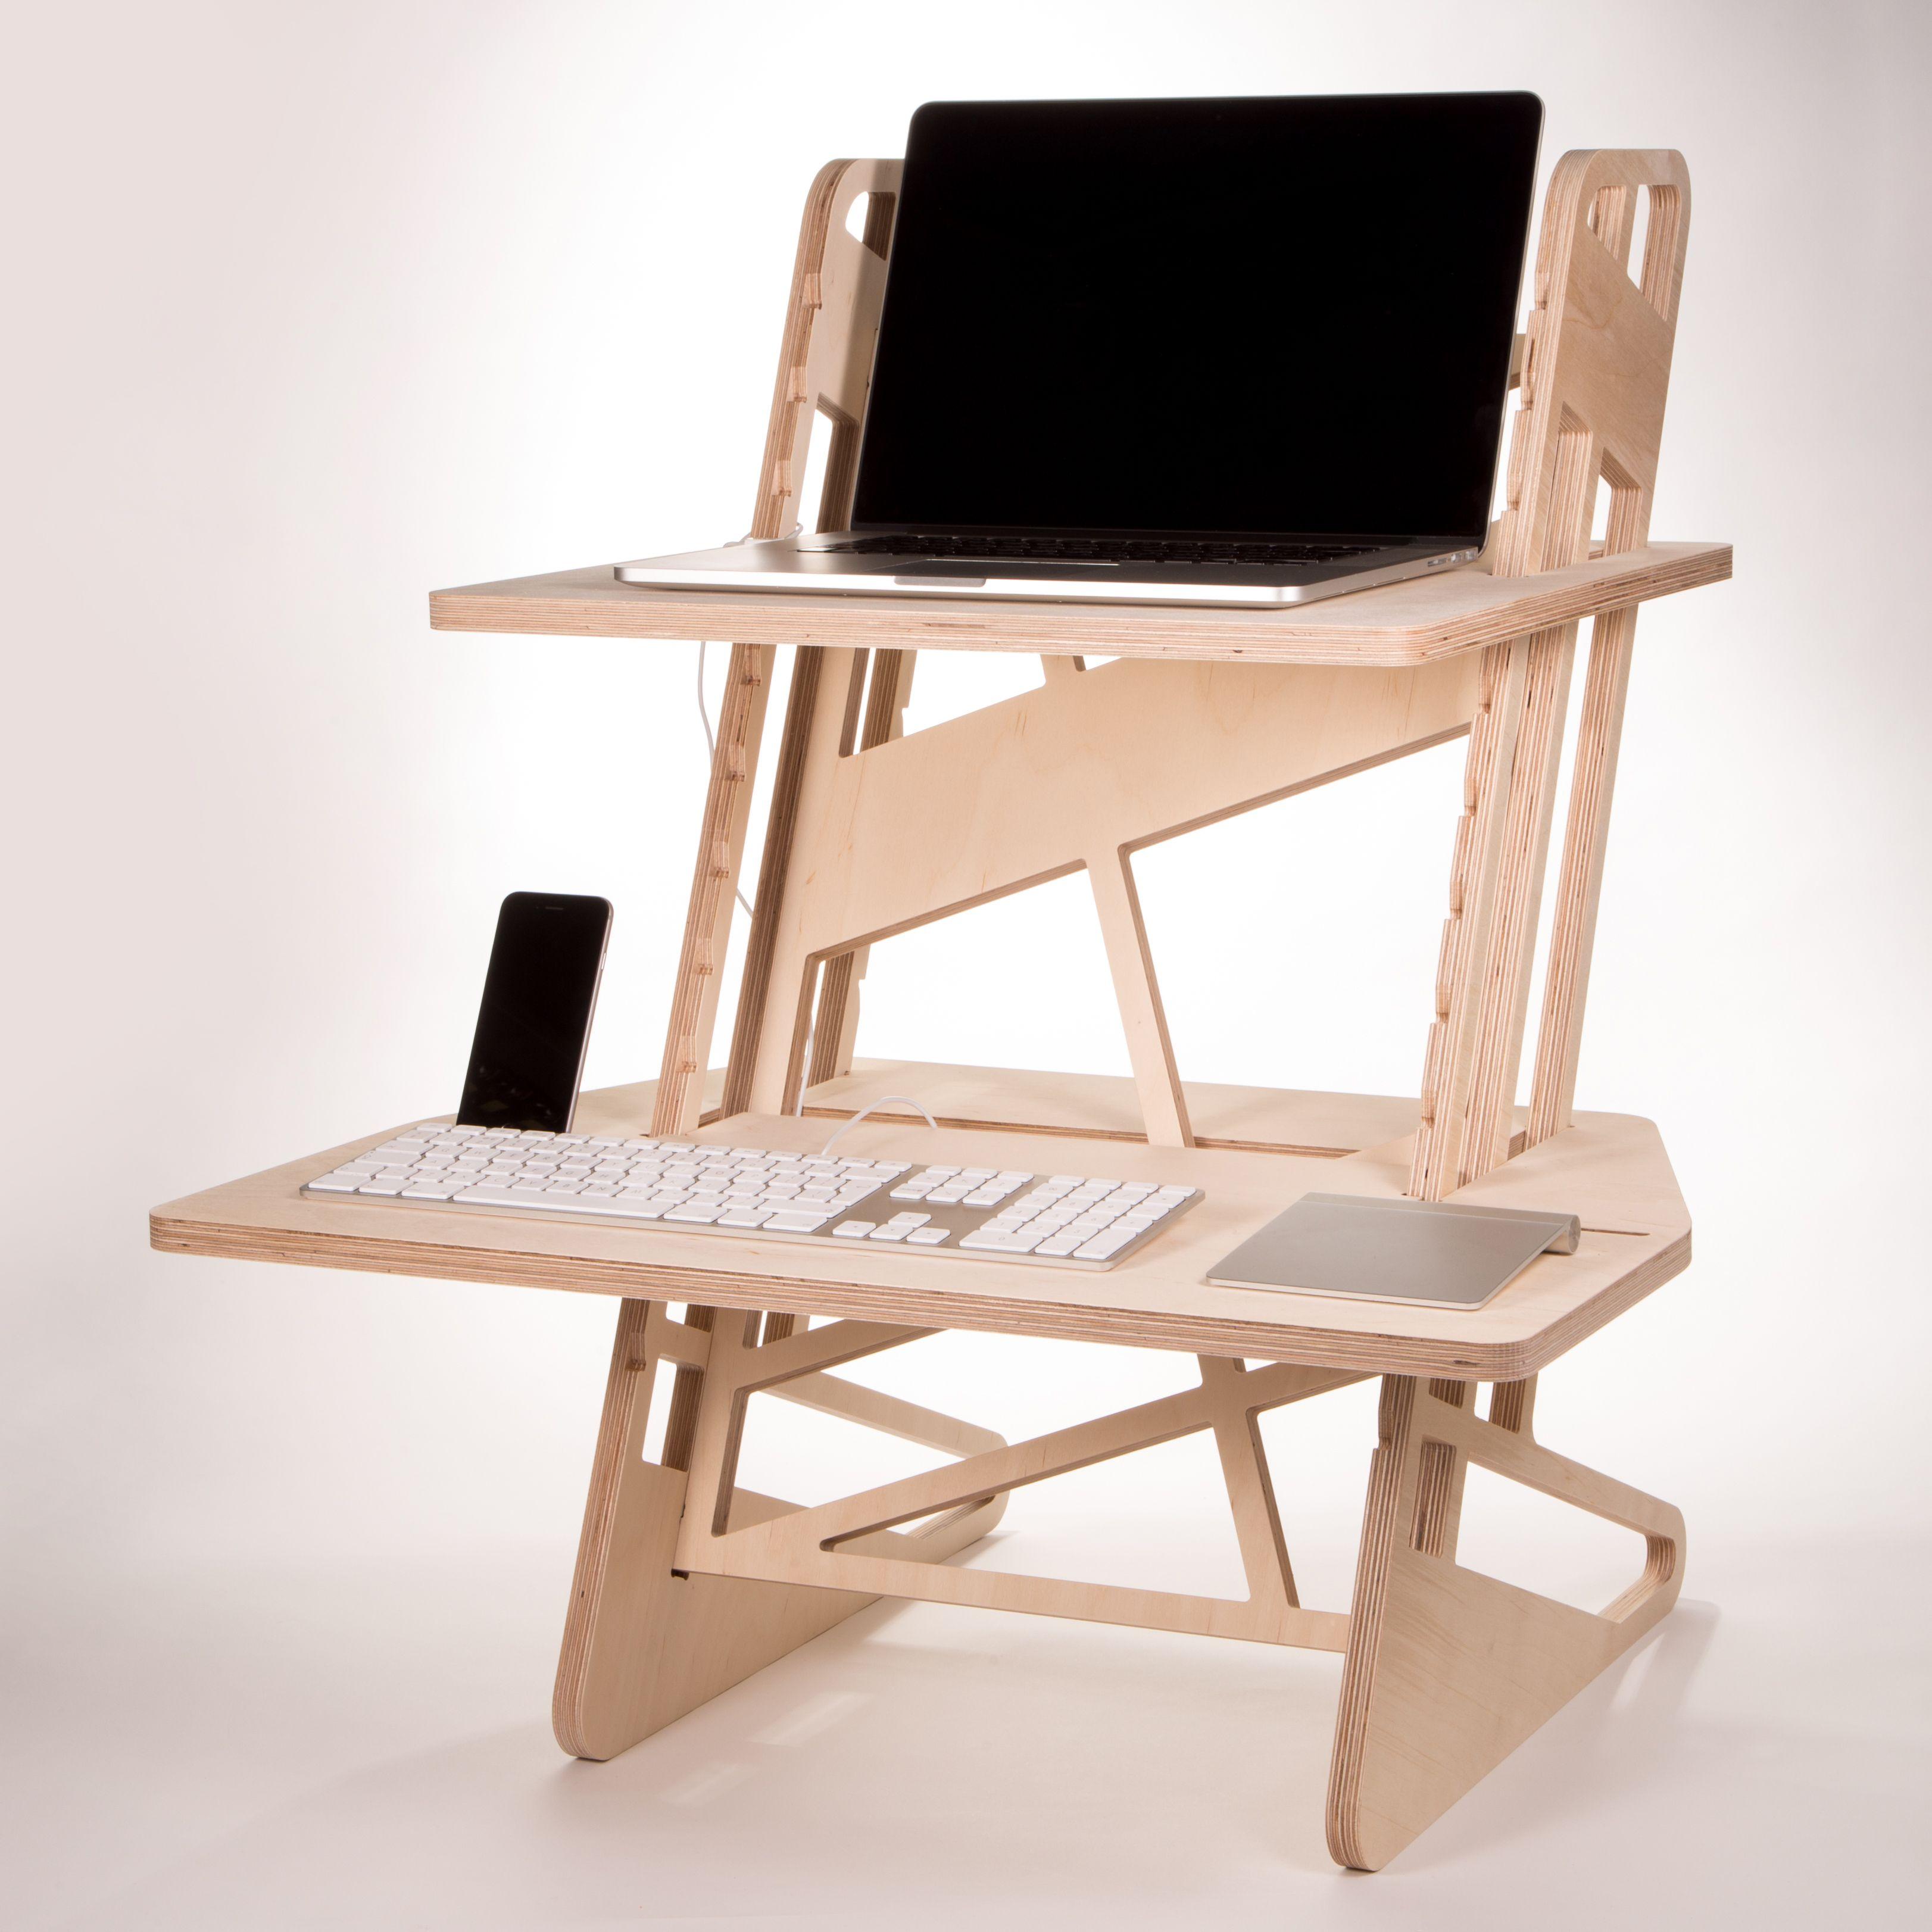 Standing Desk Converter Cnc Cut From European Birch Plywood